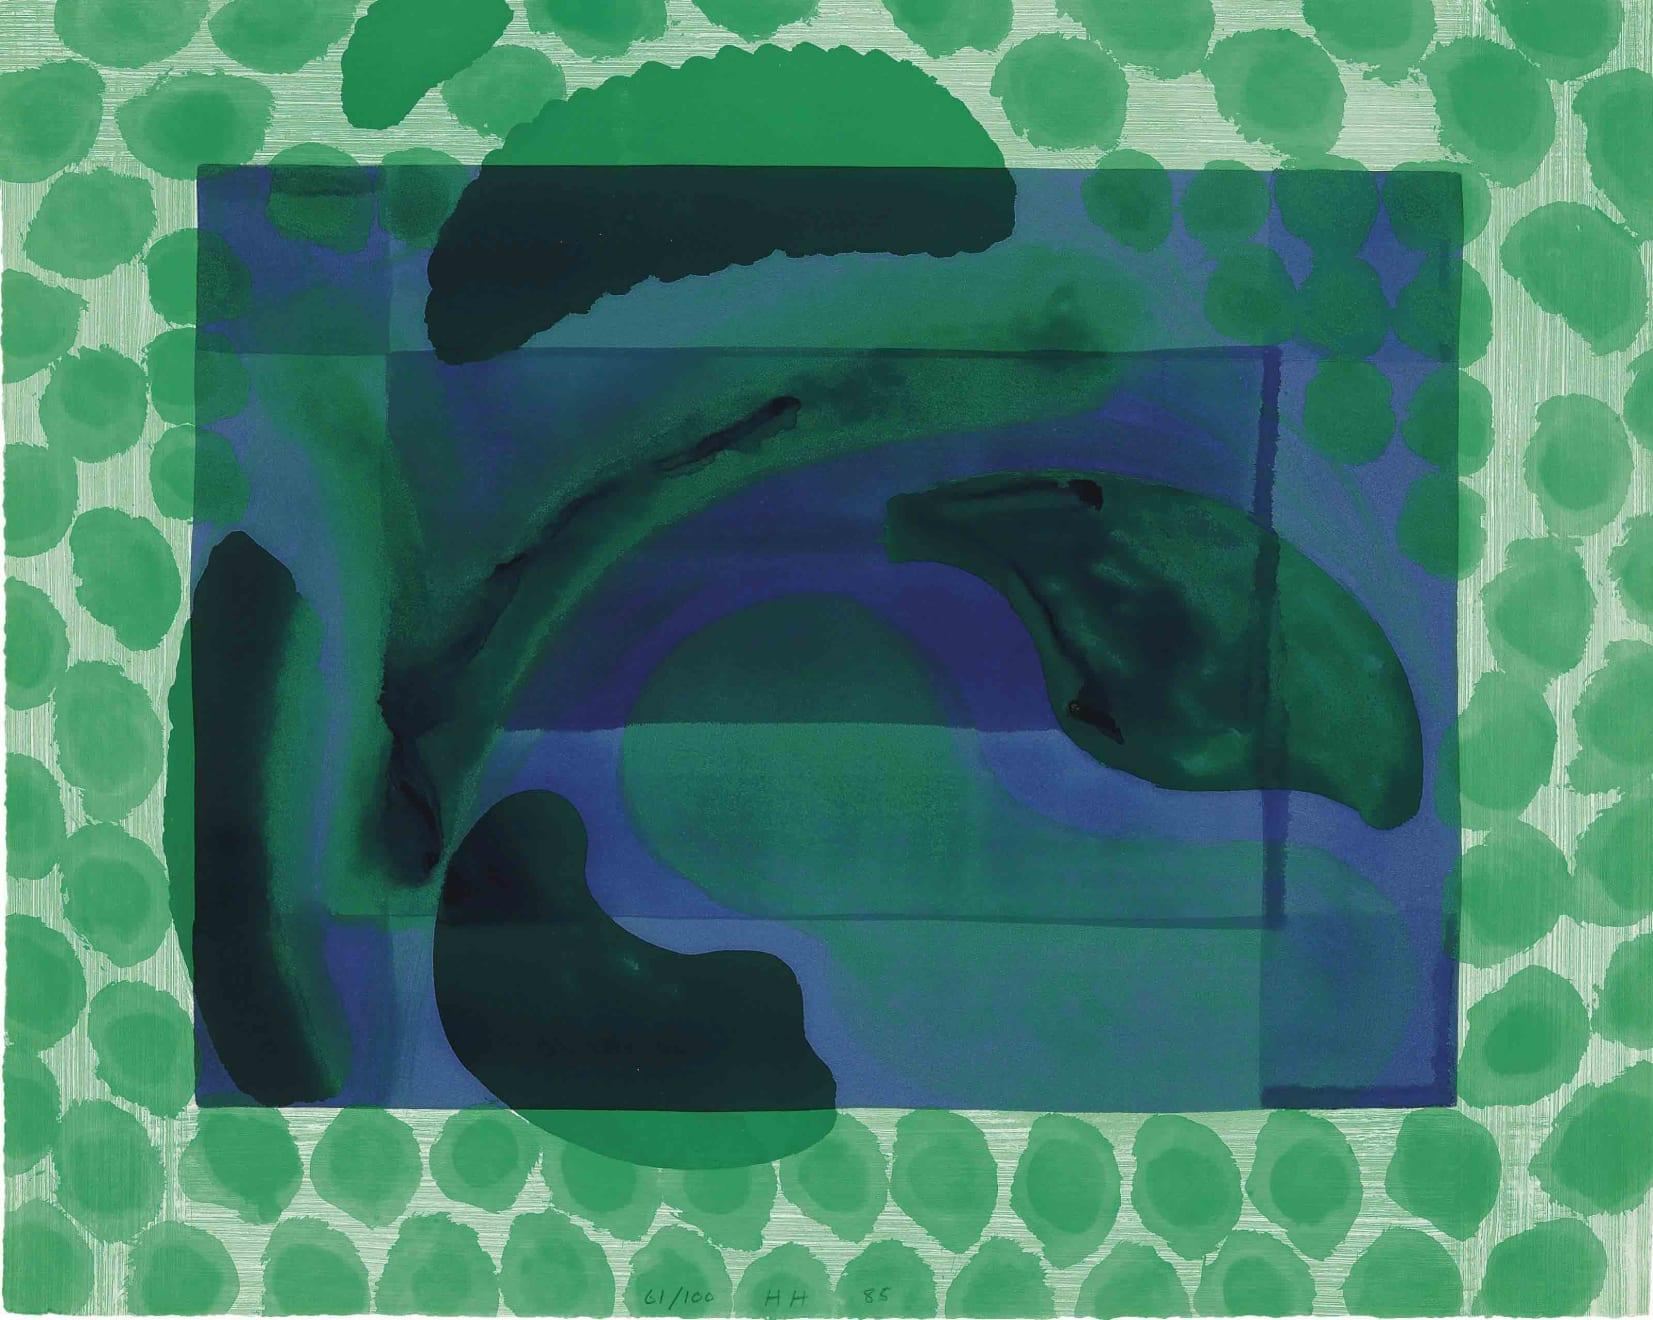 Howard Hodgkin, David's Pool, 1979 - 1985